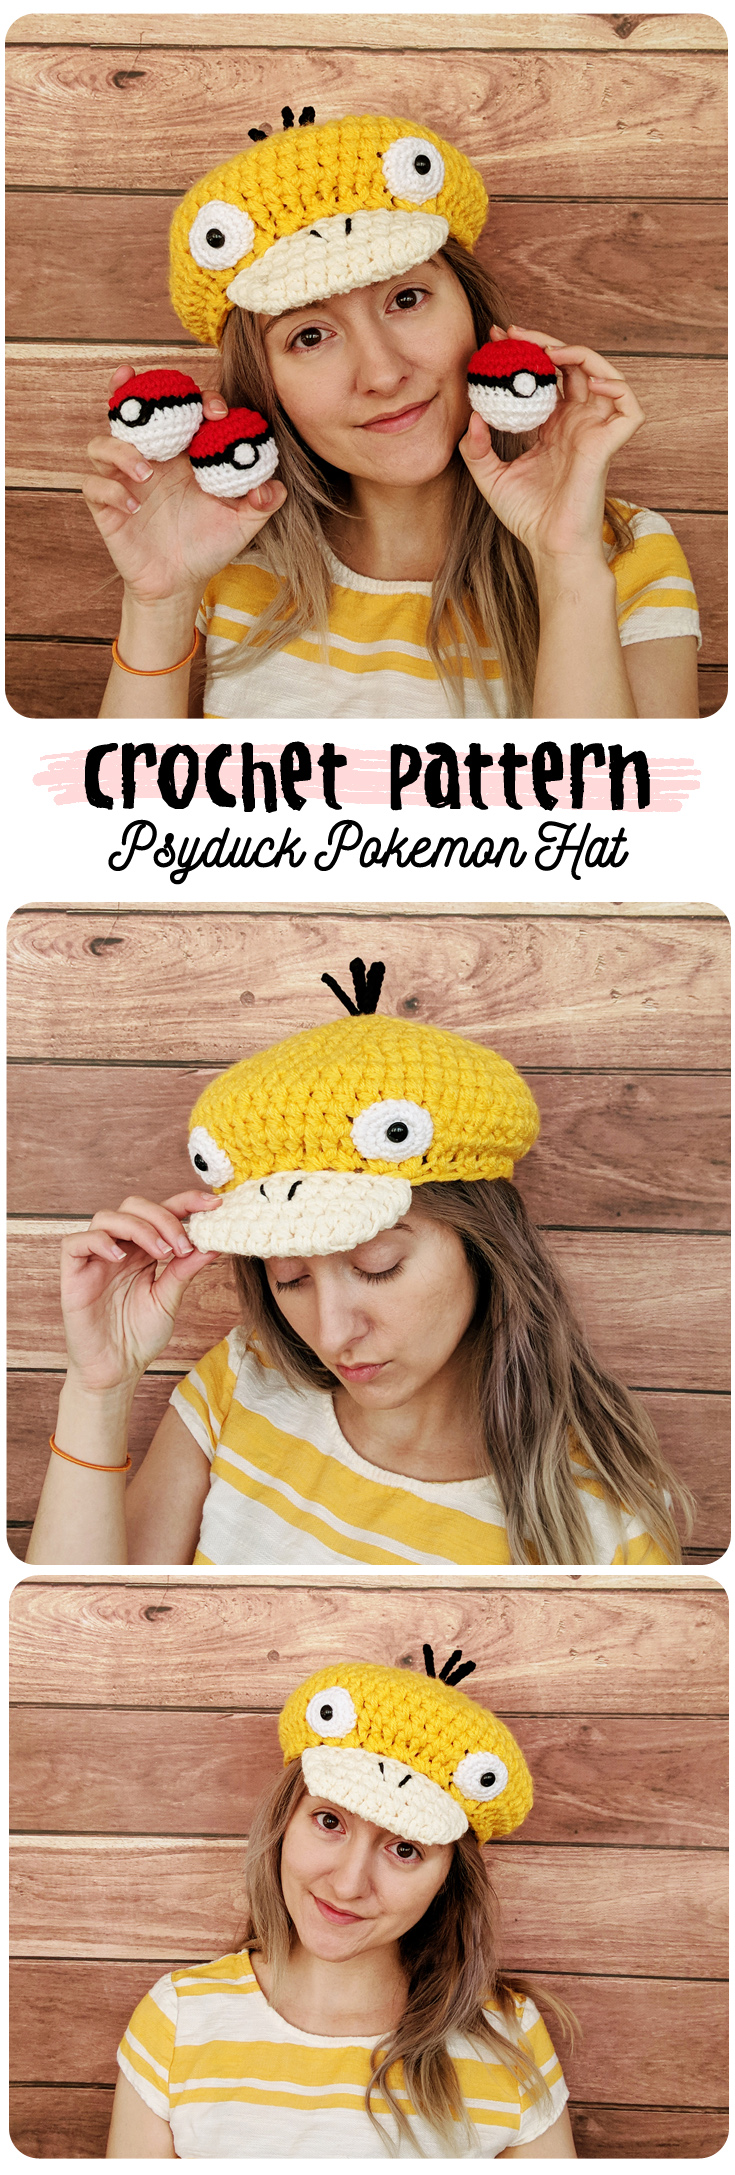 crochet-pattern-psyduck-pokemon-hat (1).jpg